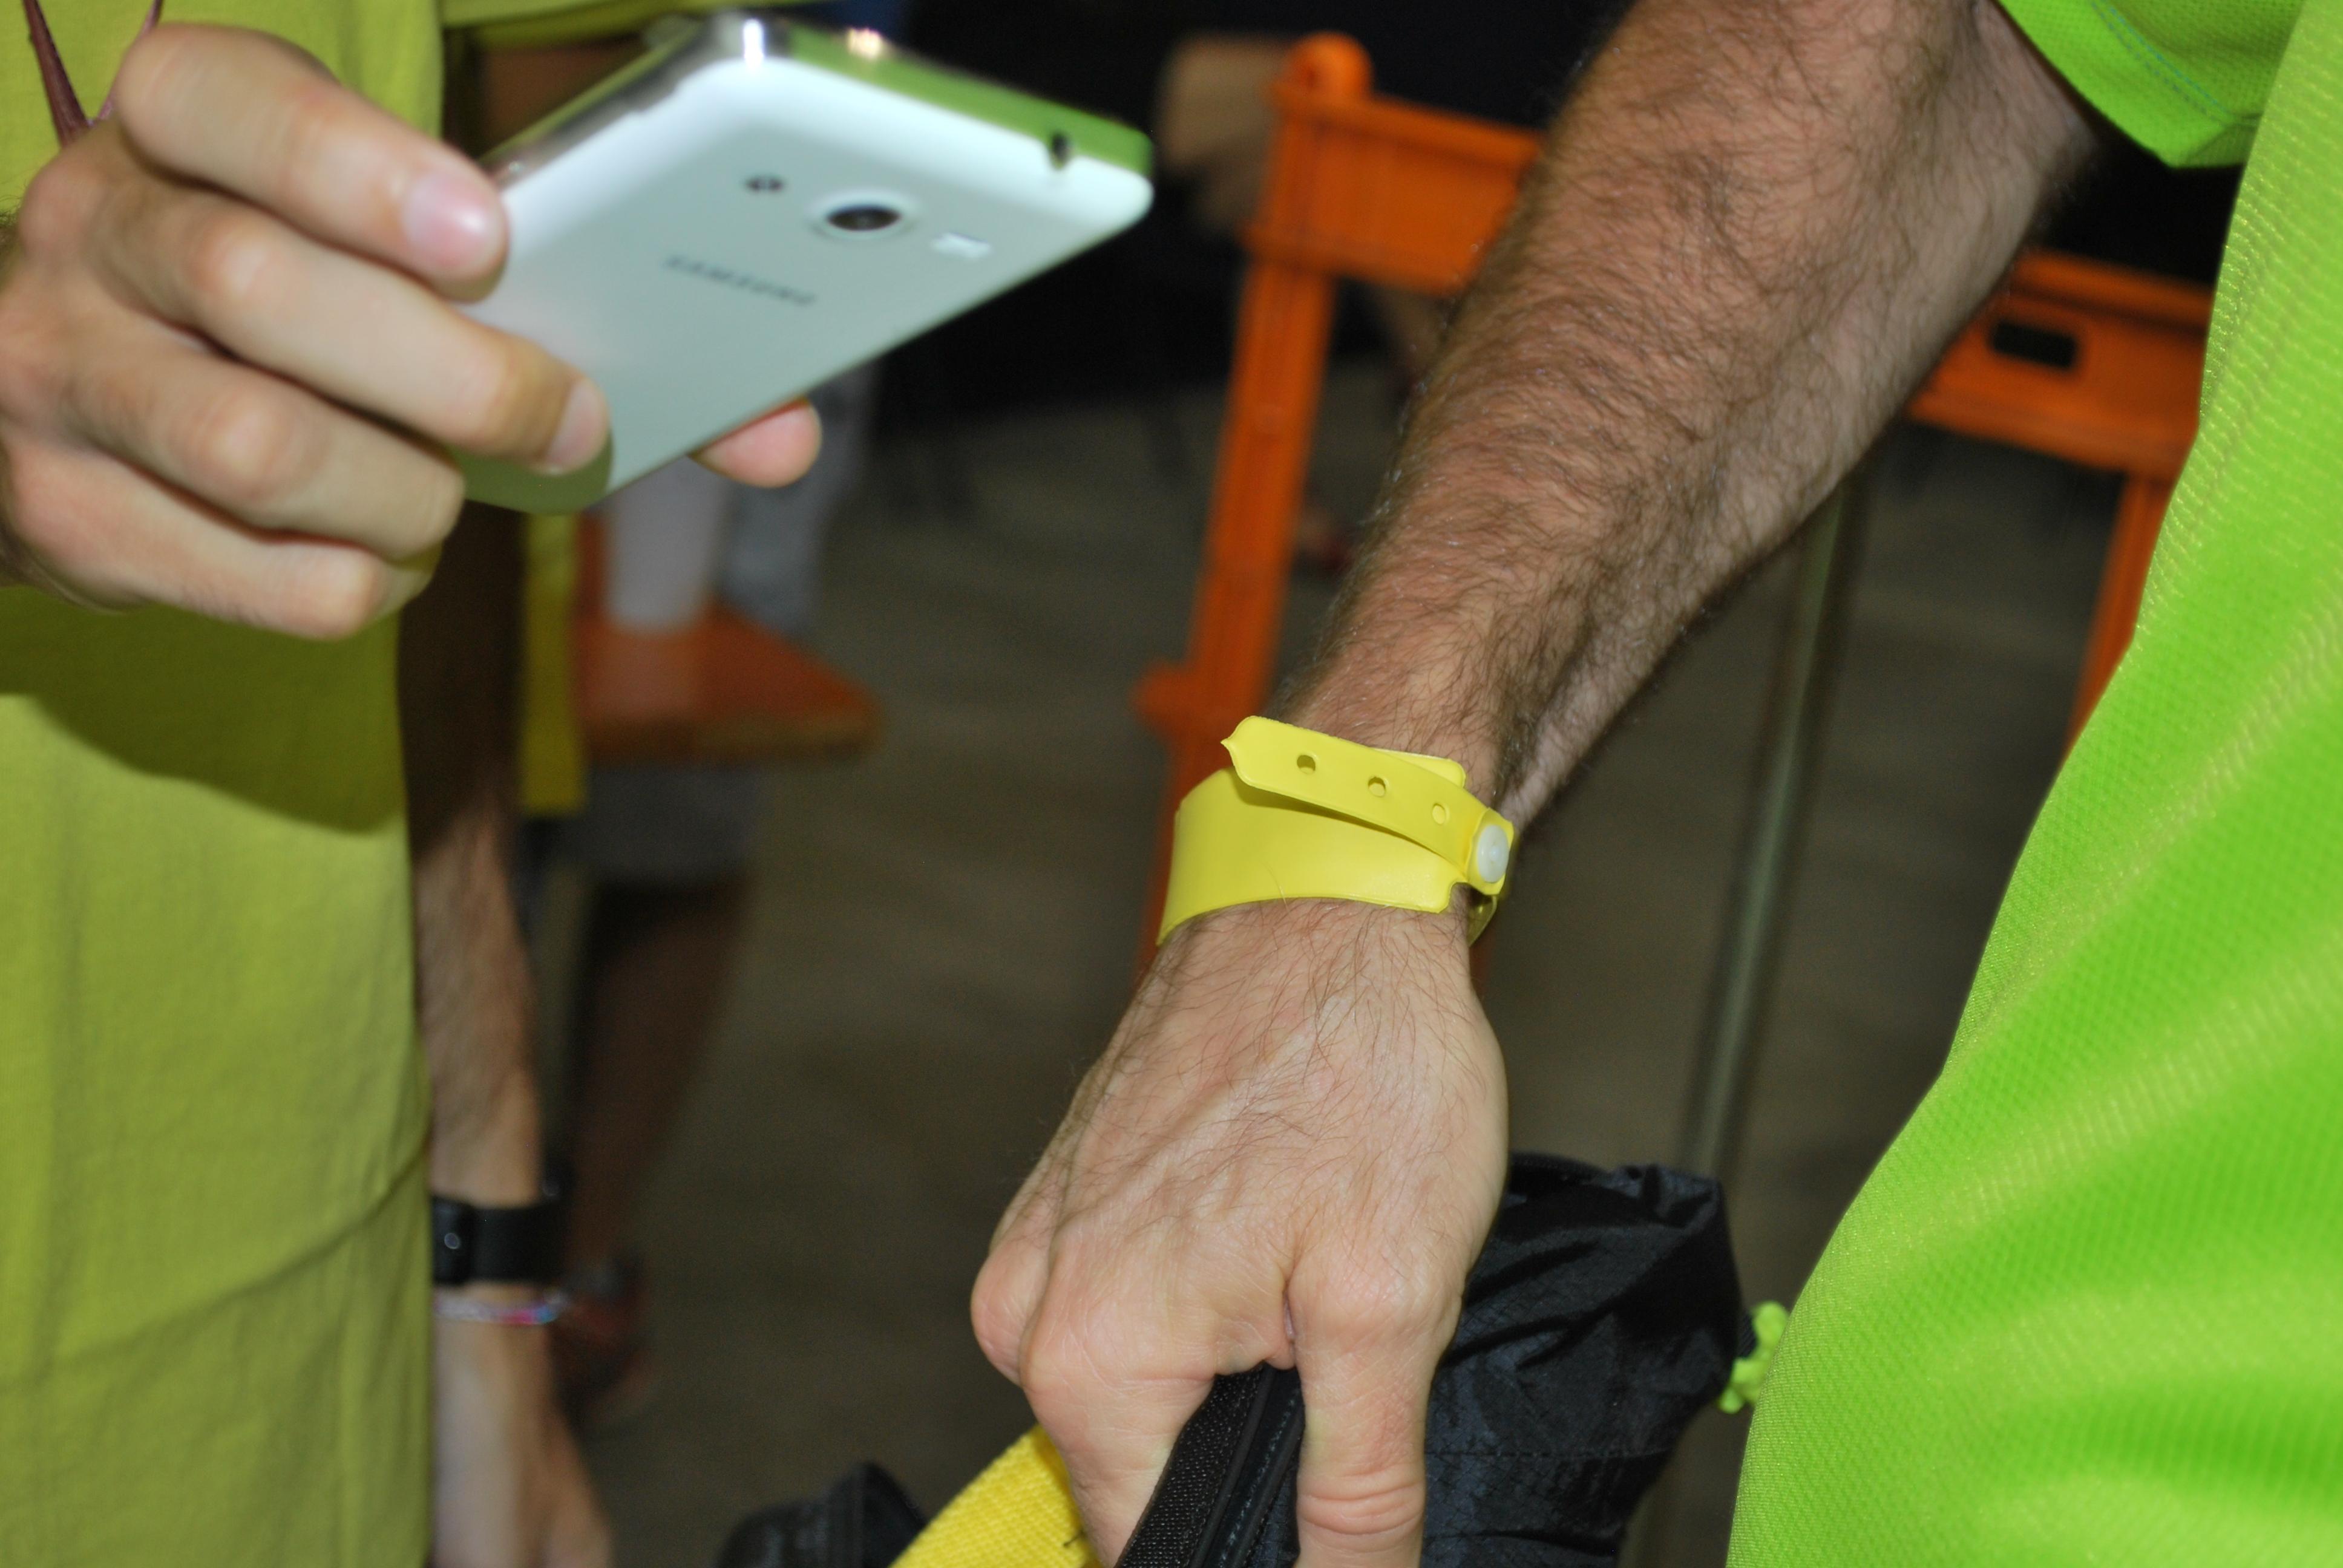 Bracciale NFC